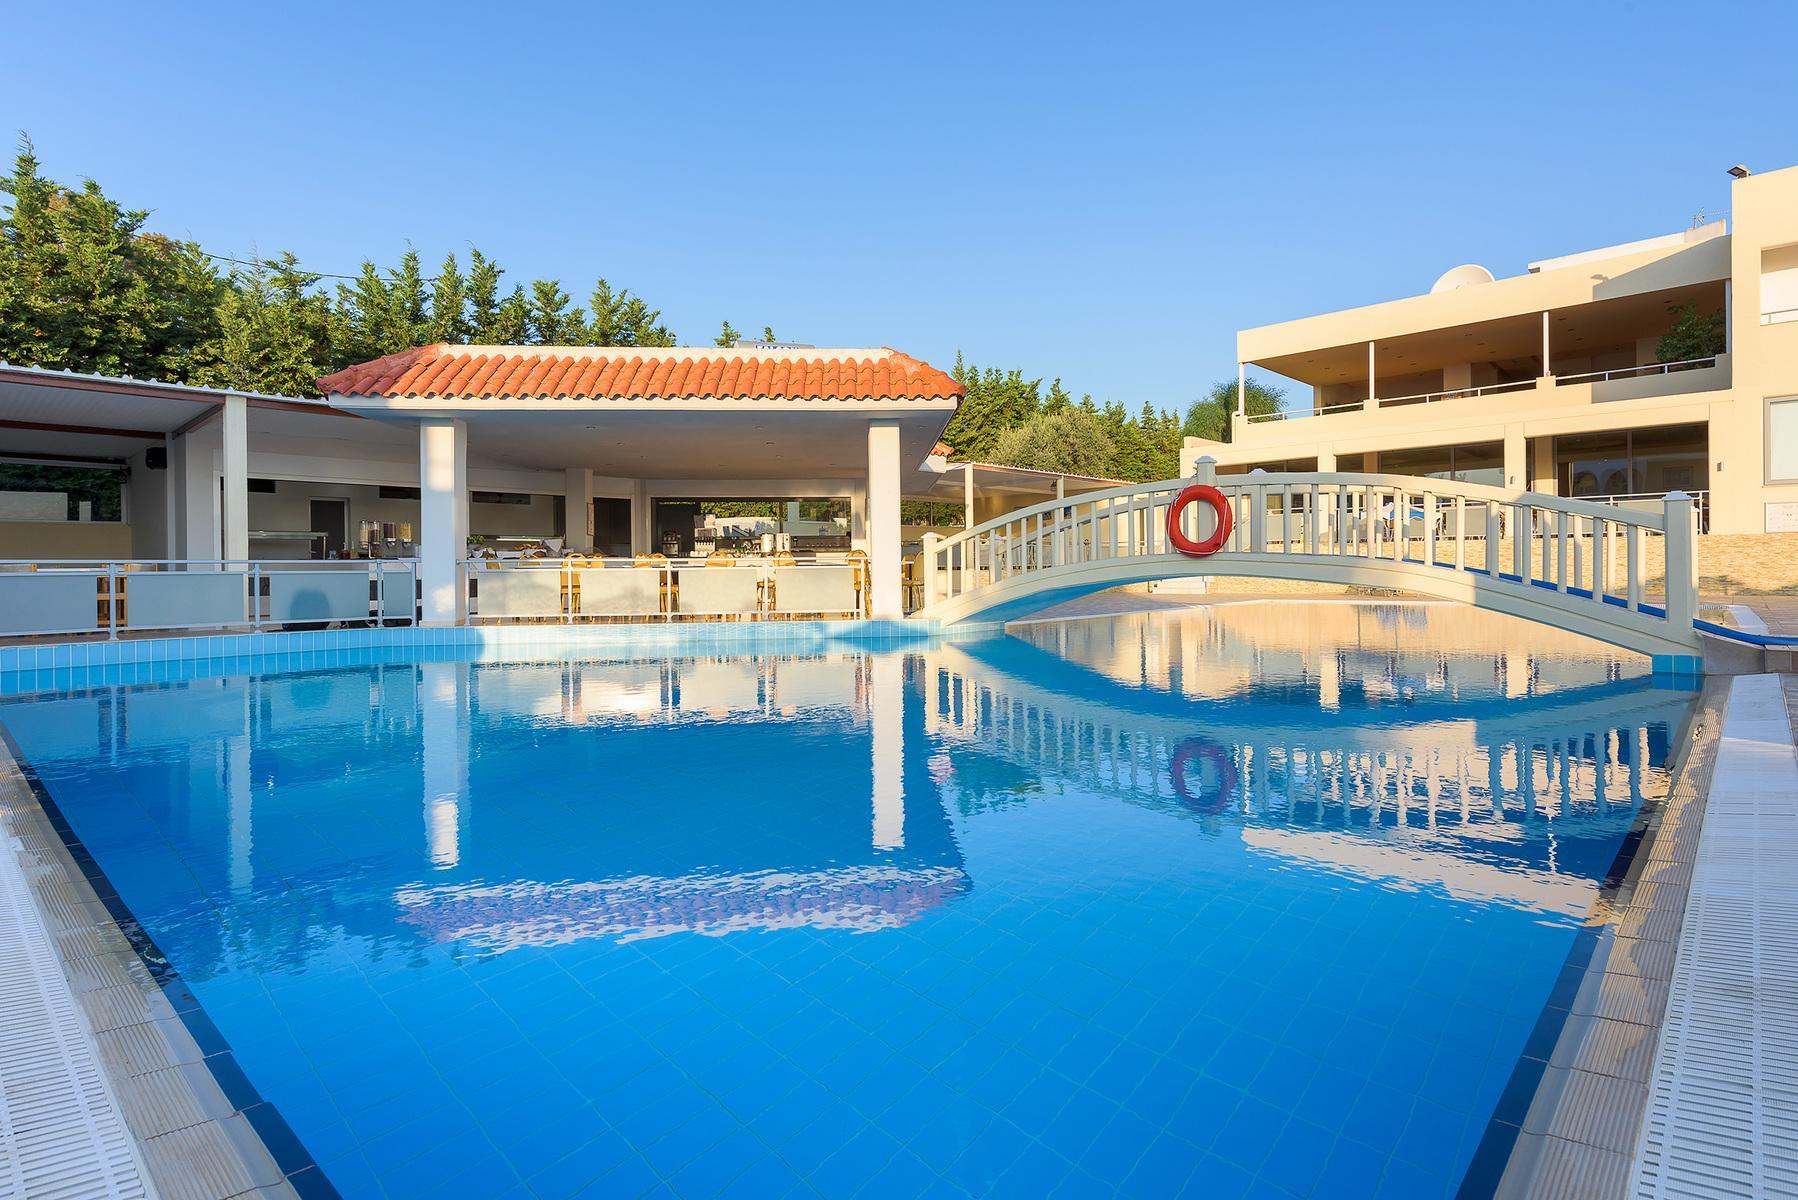 Memphis Beach Hotel, Kolymbia, Greece - …